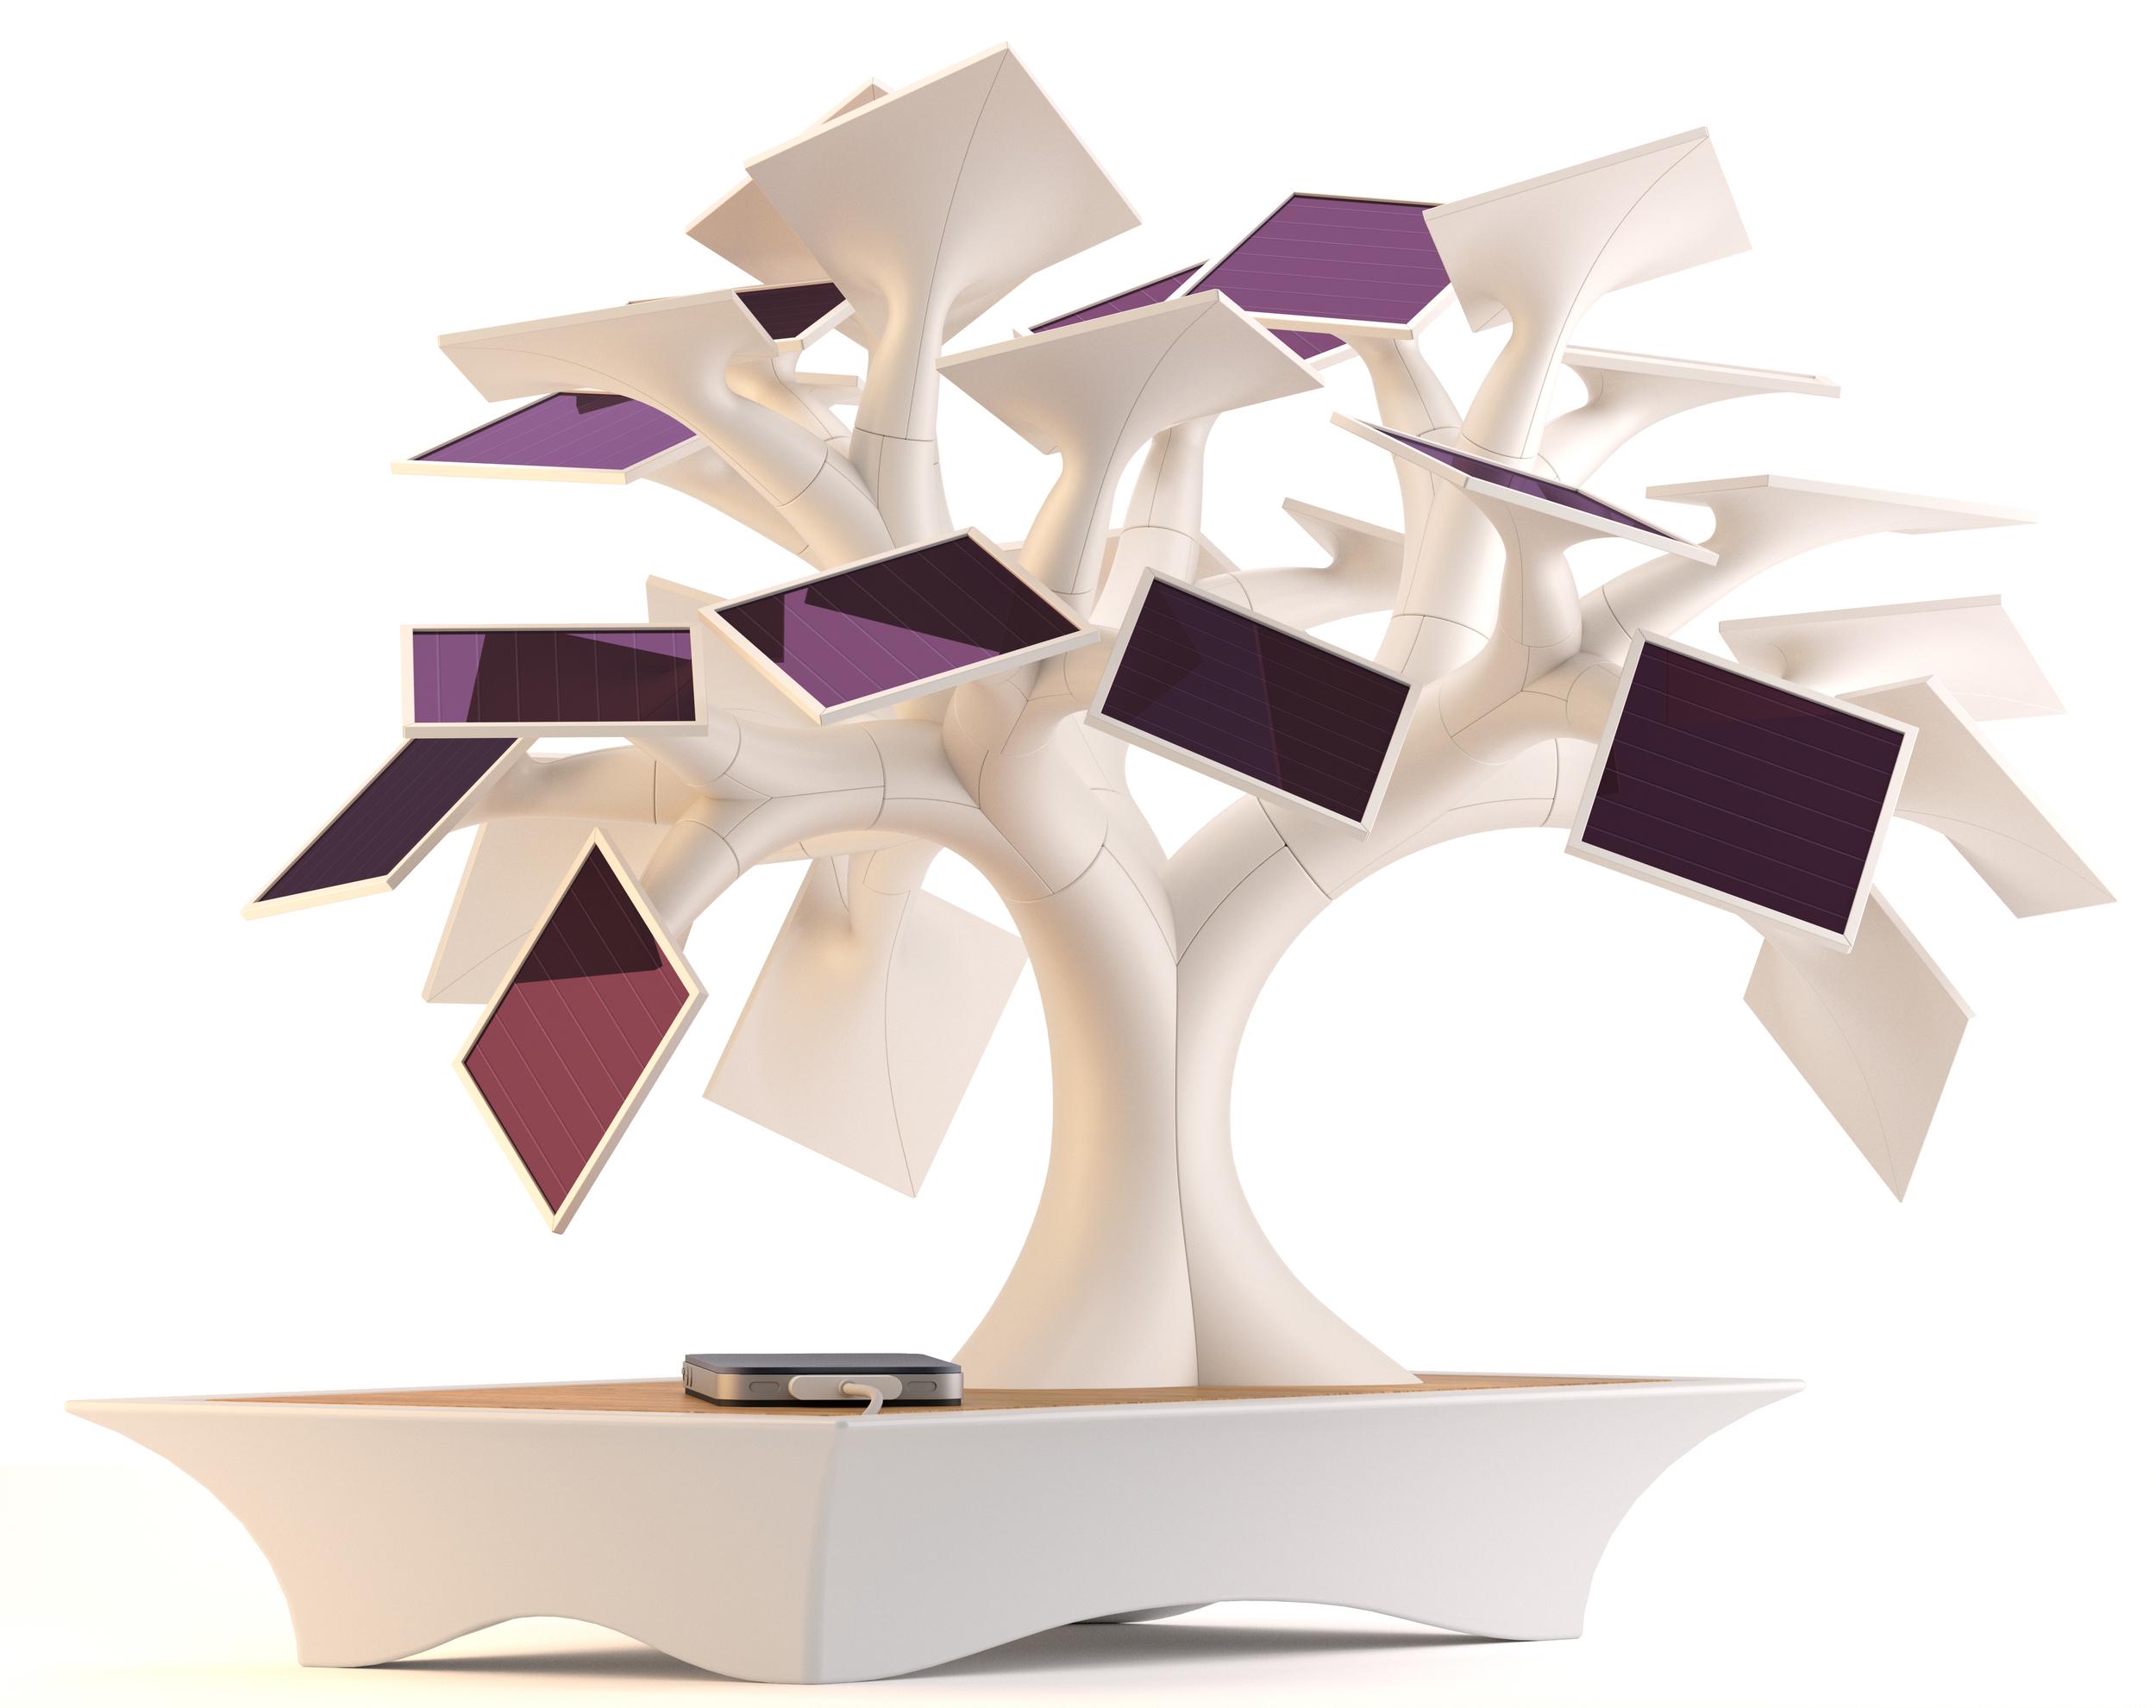 Electree, the solar tree by Vivien Muller